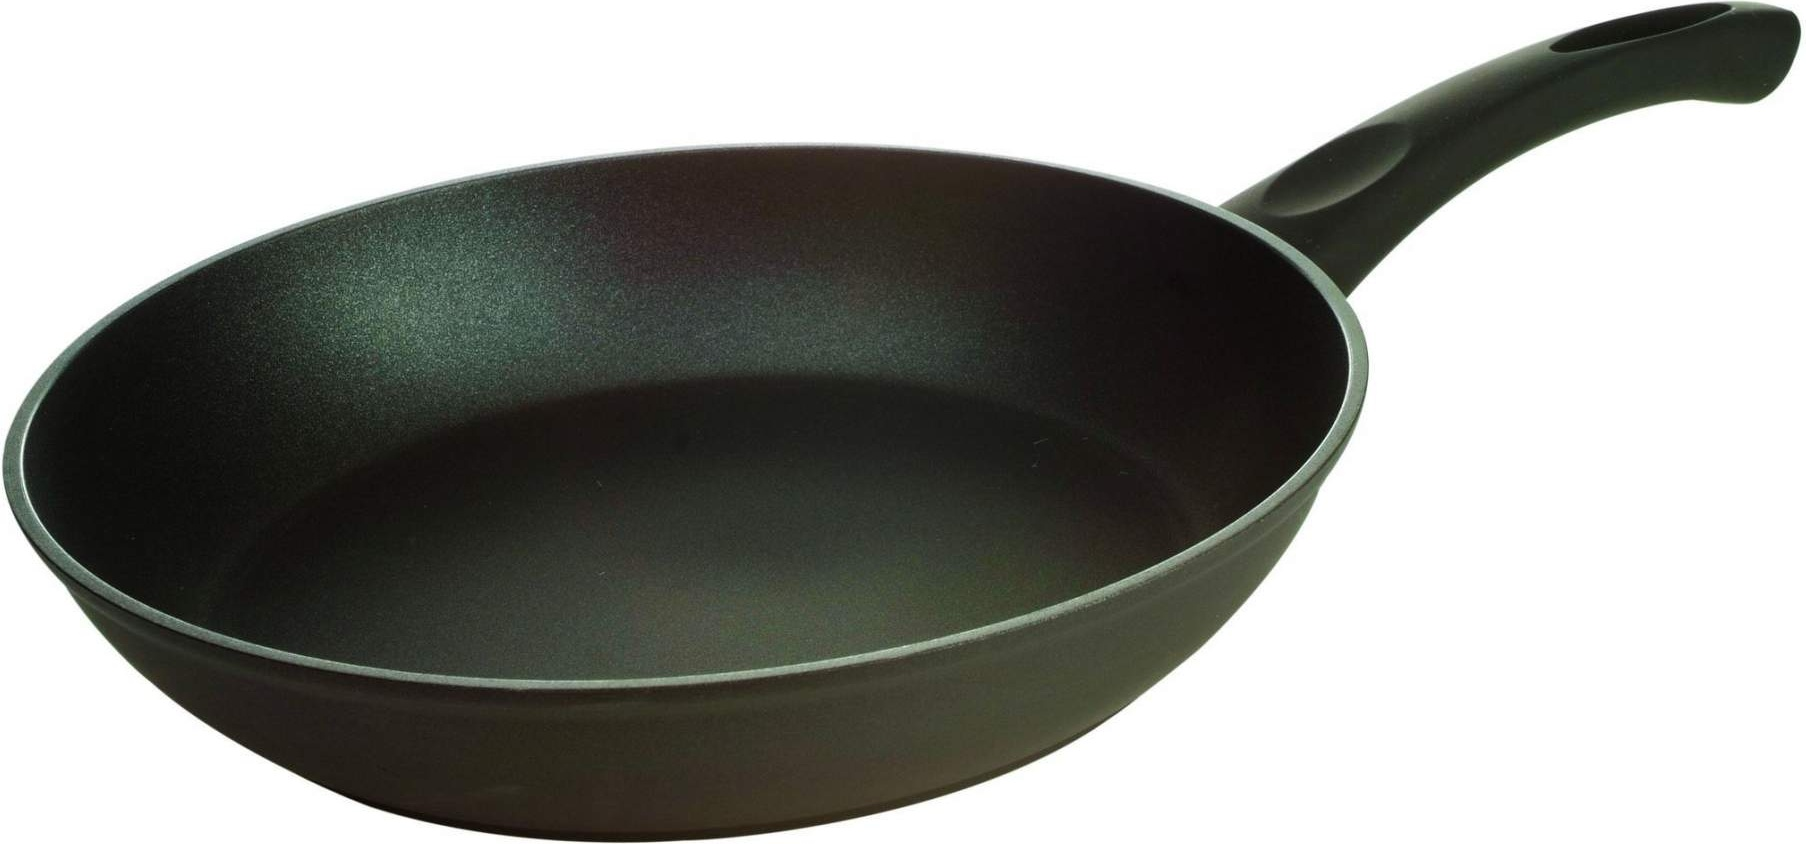 Сковорода REGENT inox Denaro 93-AL-DE-1-28 28 см